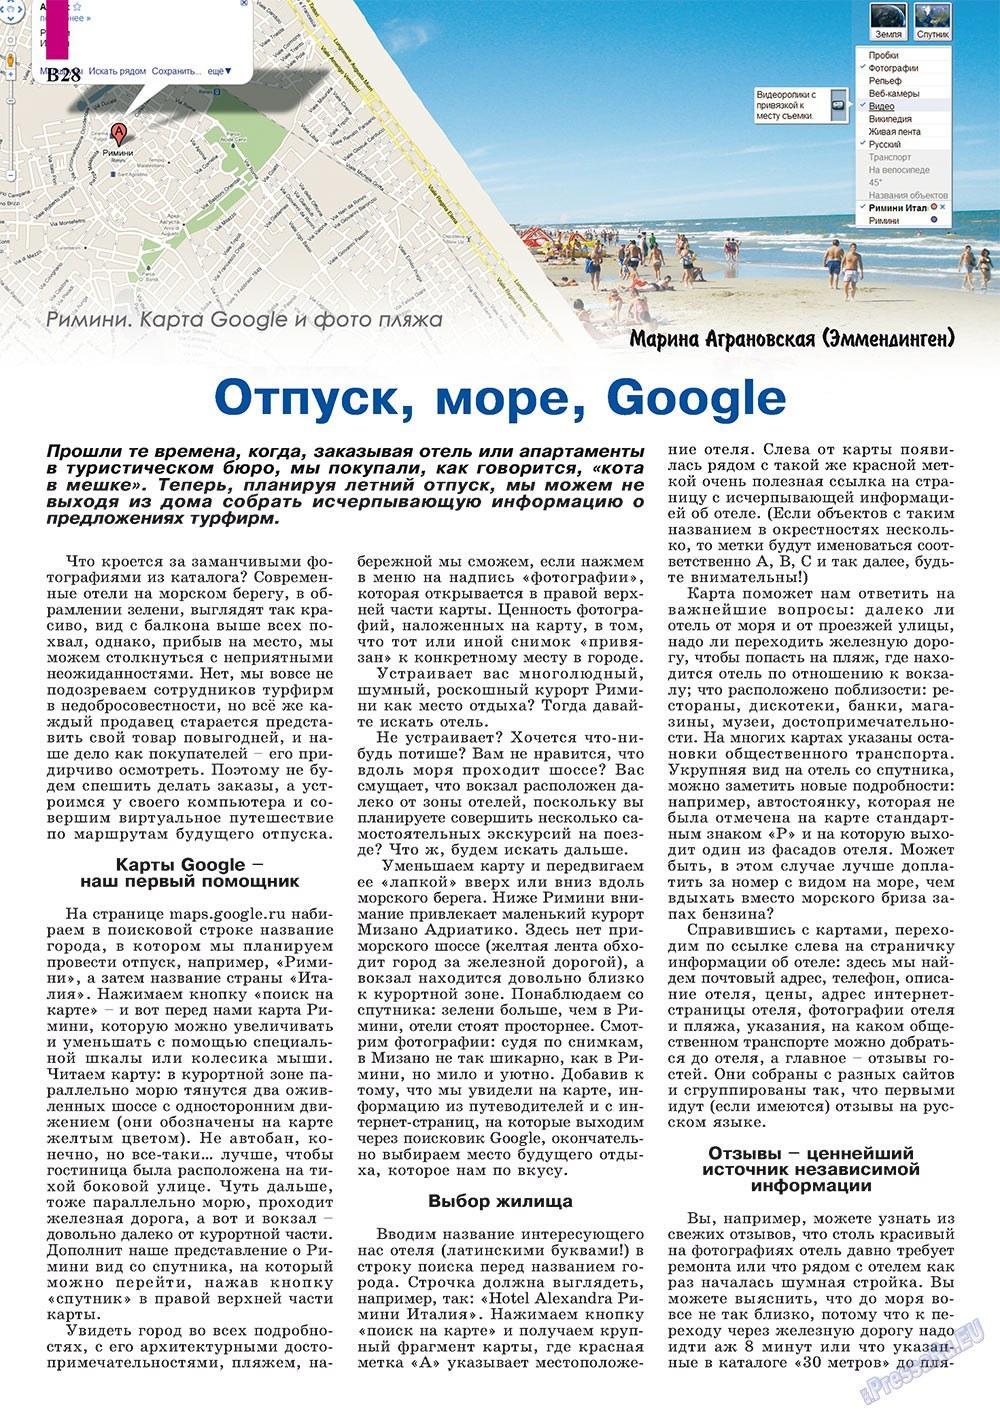 Партнер-север (журнал). 2011 год, номер 7, стр. 38